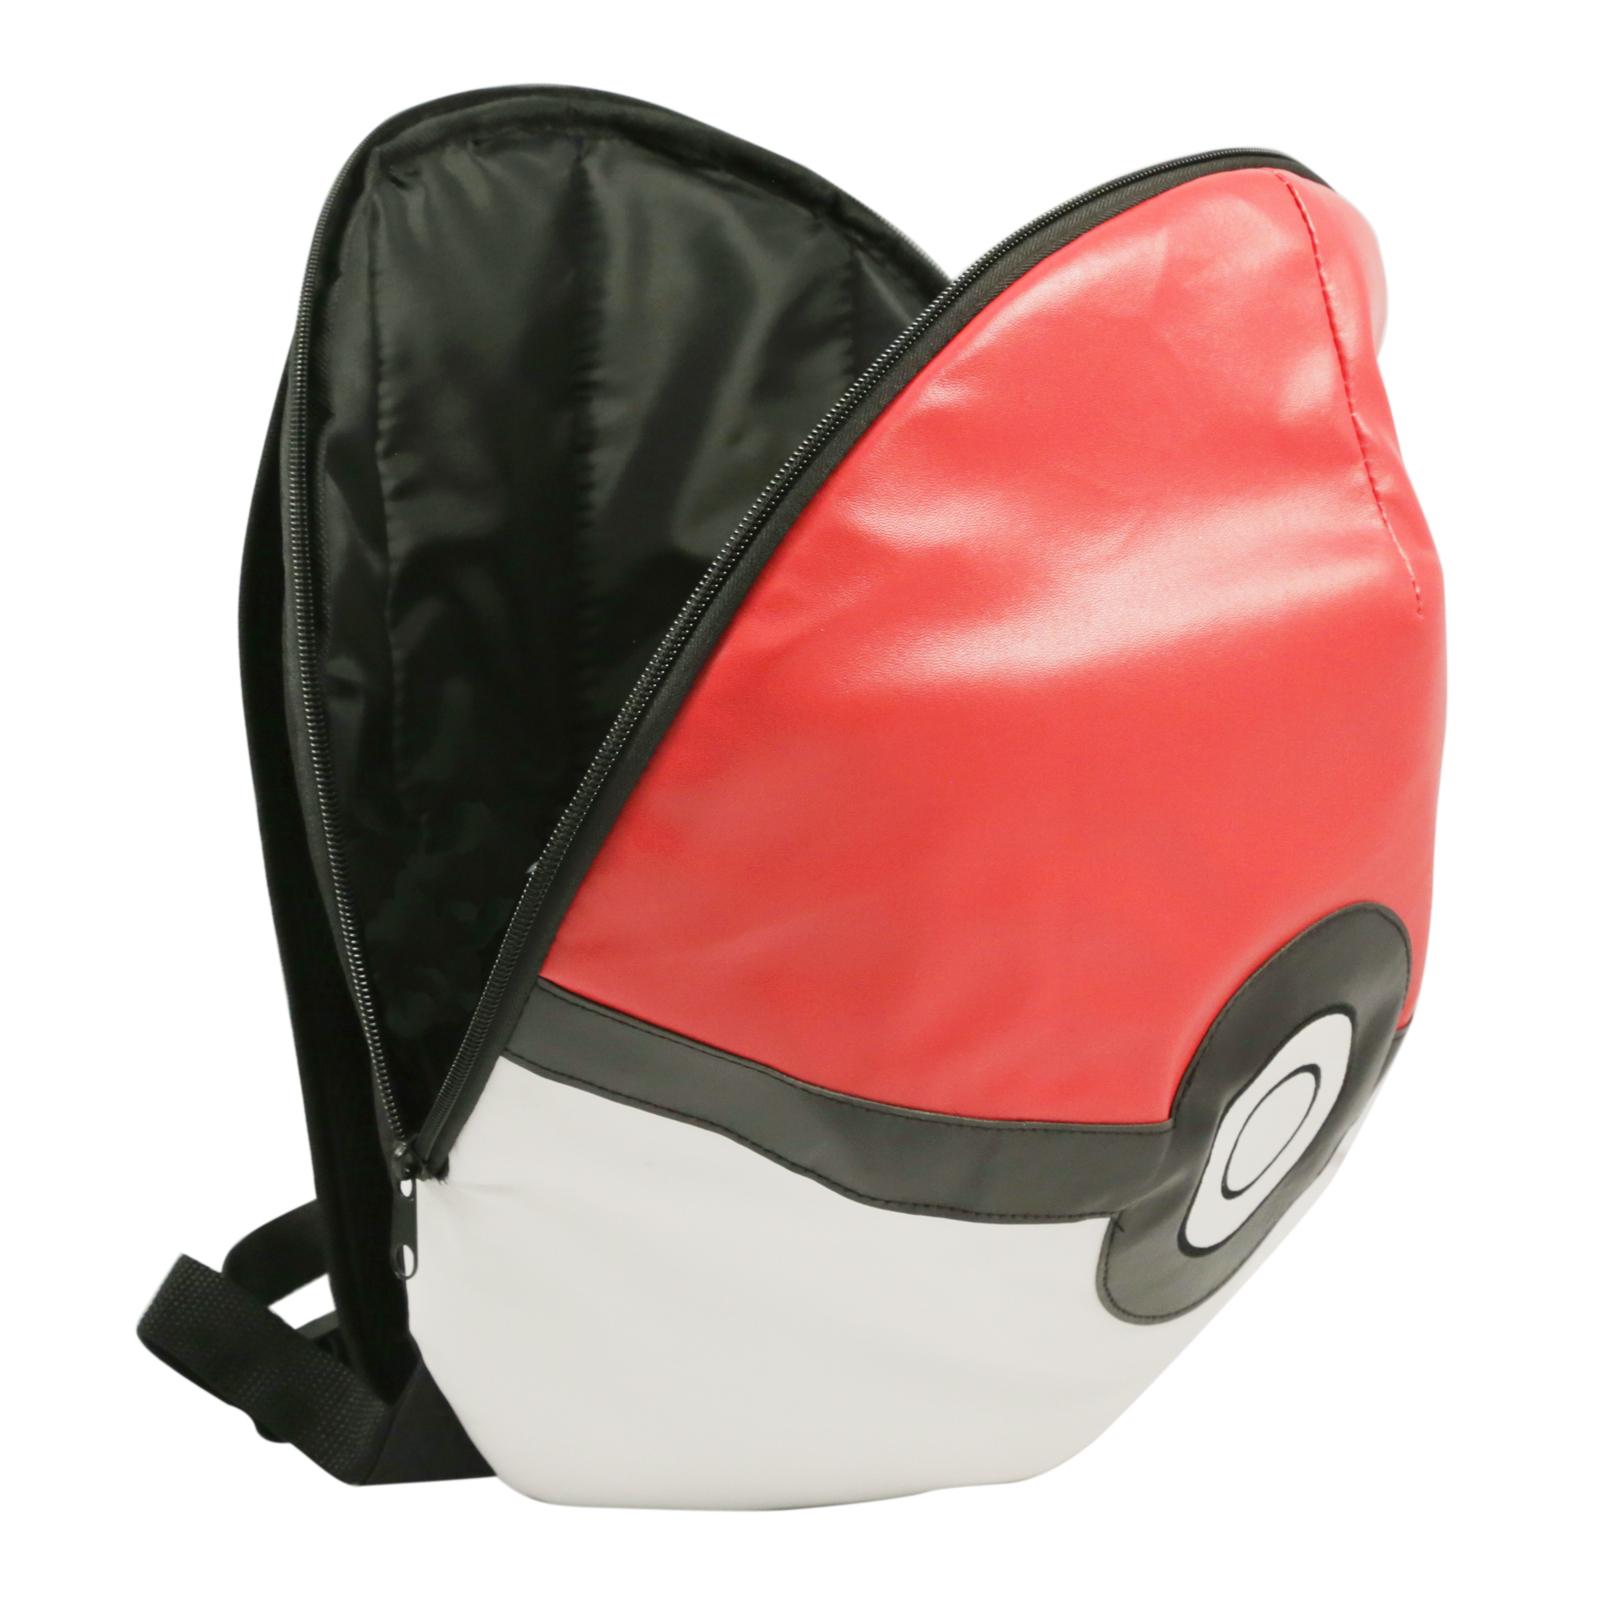 "Pokemon Backpack ""Pokeball"" Theme Back to School Travel Bag"